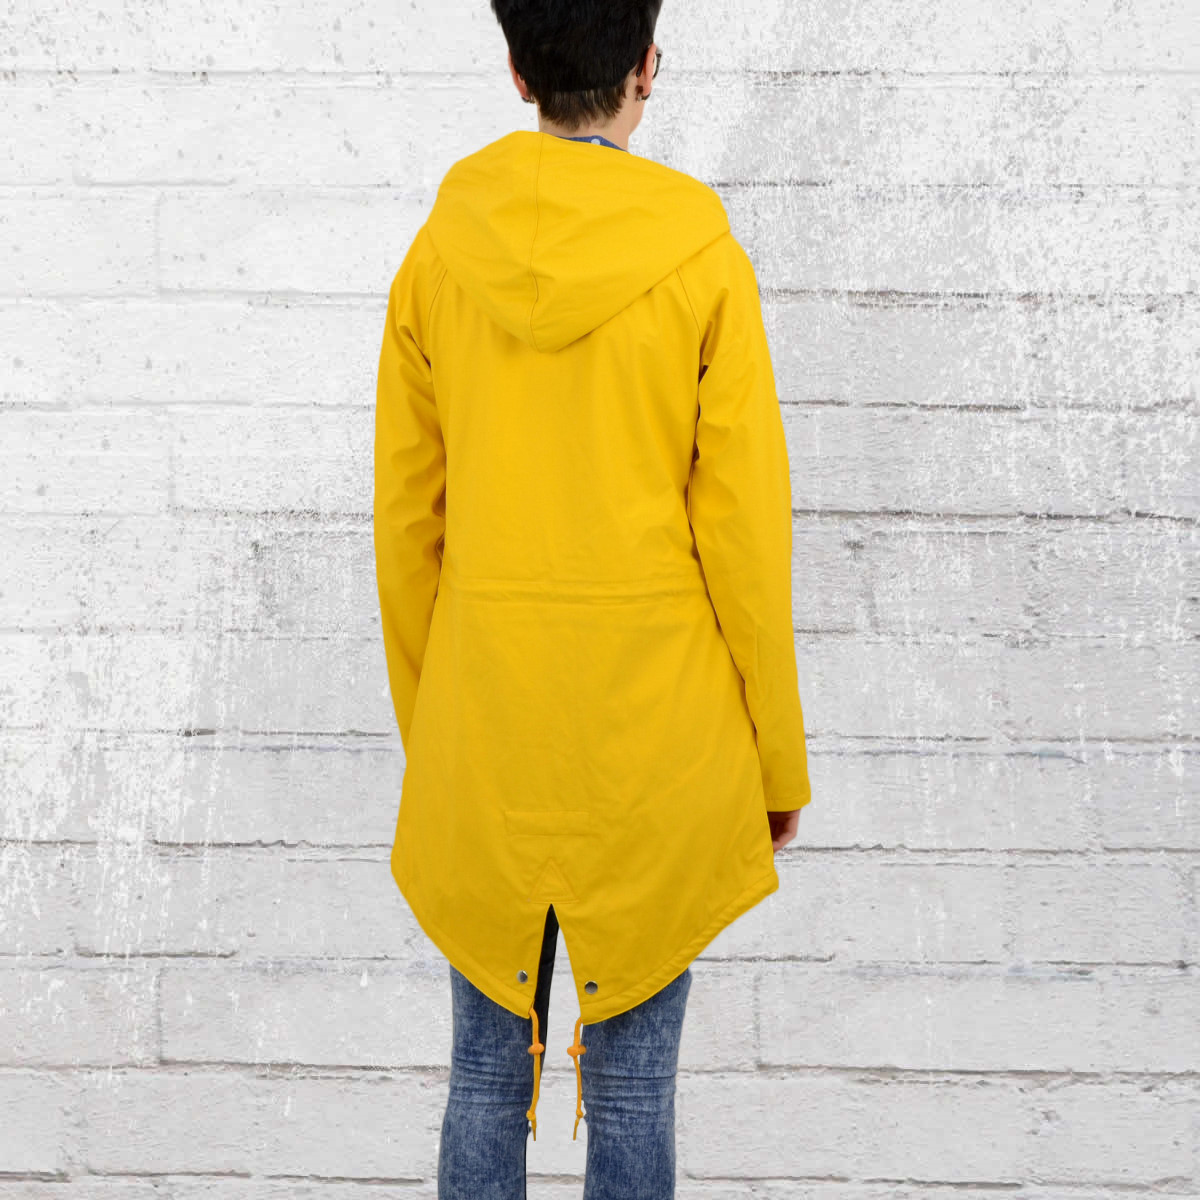 derbe regenjacke dots travel friese frauen regenmantel gelb jetzt bestellen. Black Bedroom Furniture Sets. Home Design Ideas